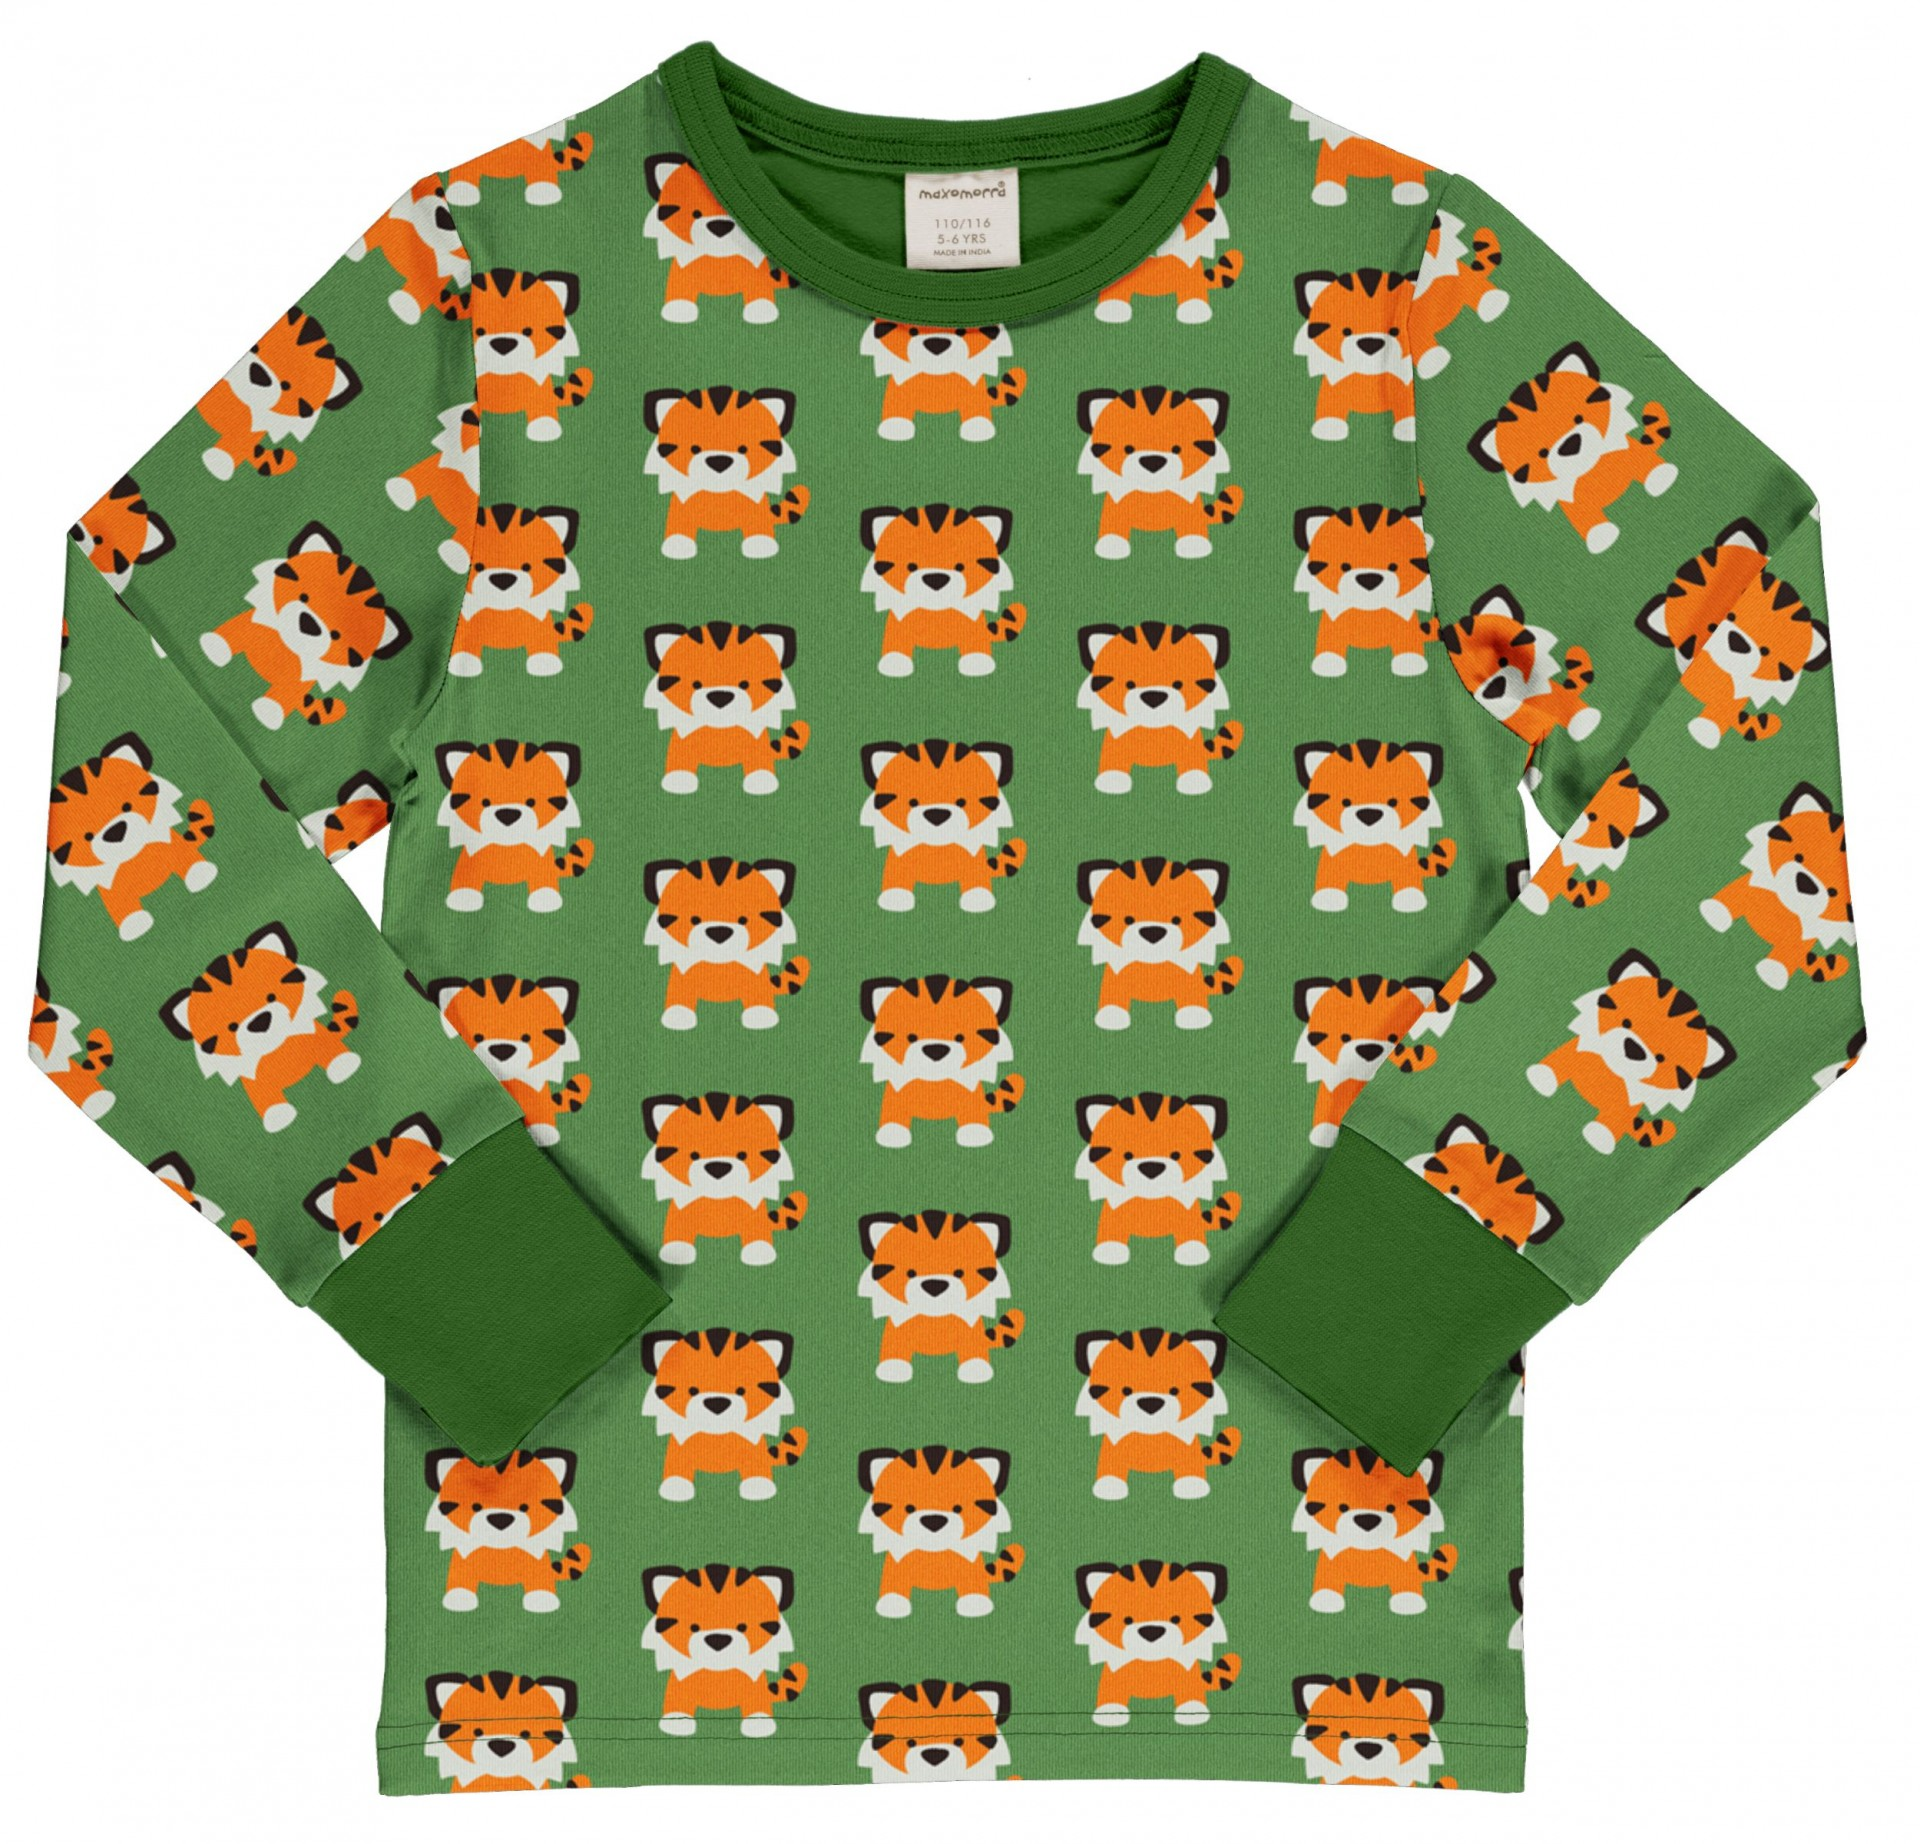 Camisola TANGERINE TIGER Maxomorra (Tamanhos disponíveis 9-12m, 18-24m)